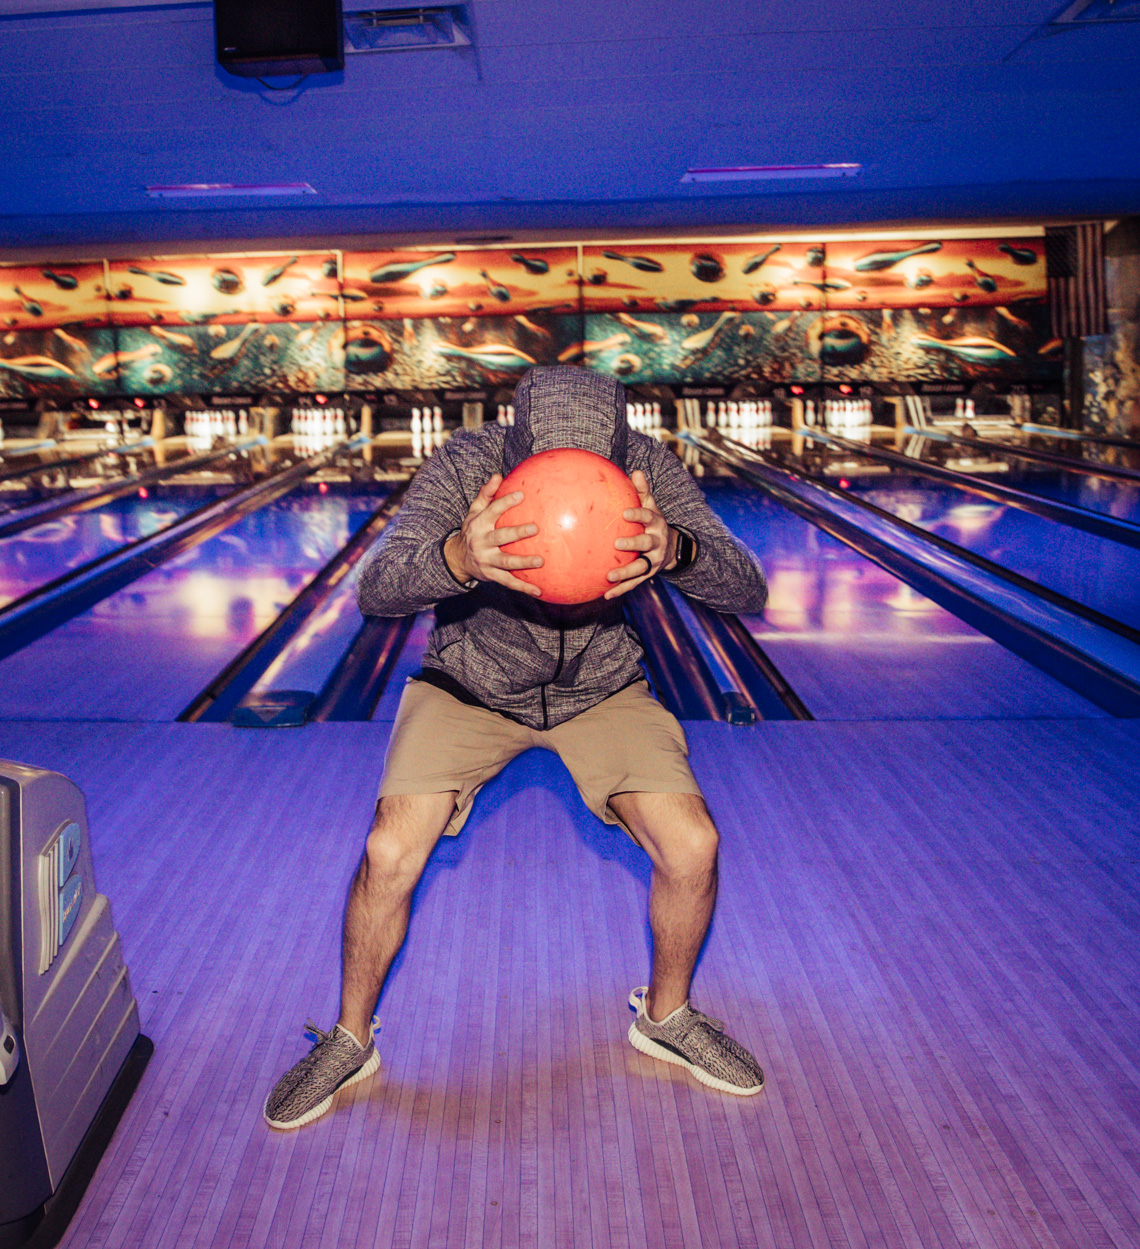 BowlingParty_3_22_19_204.jpg